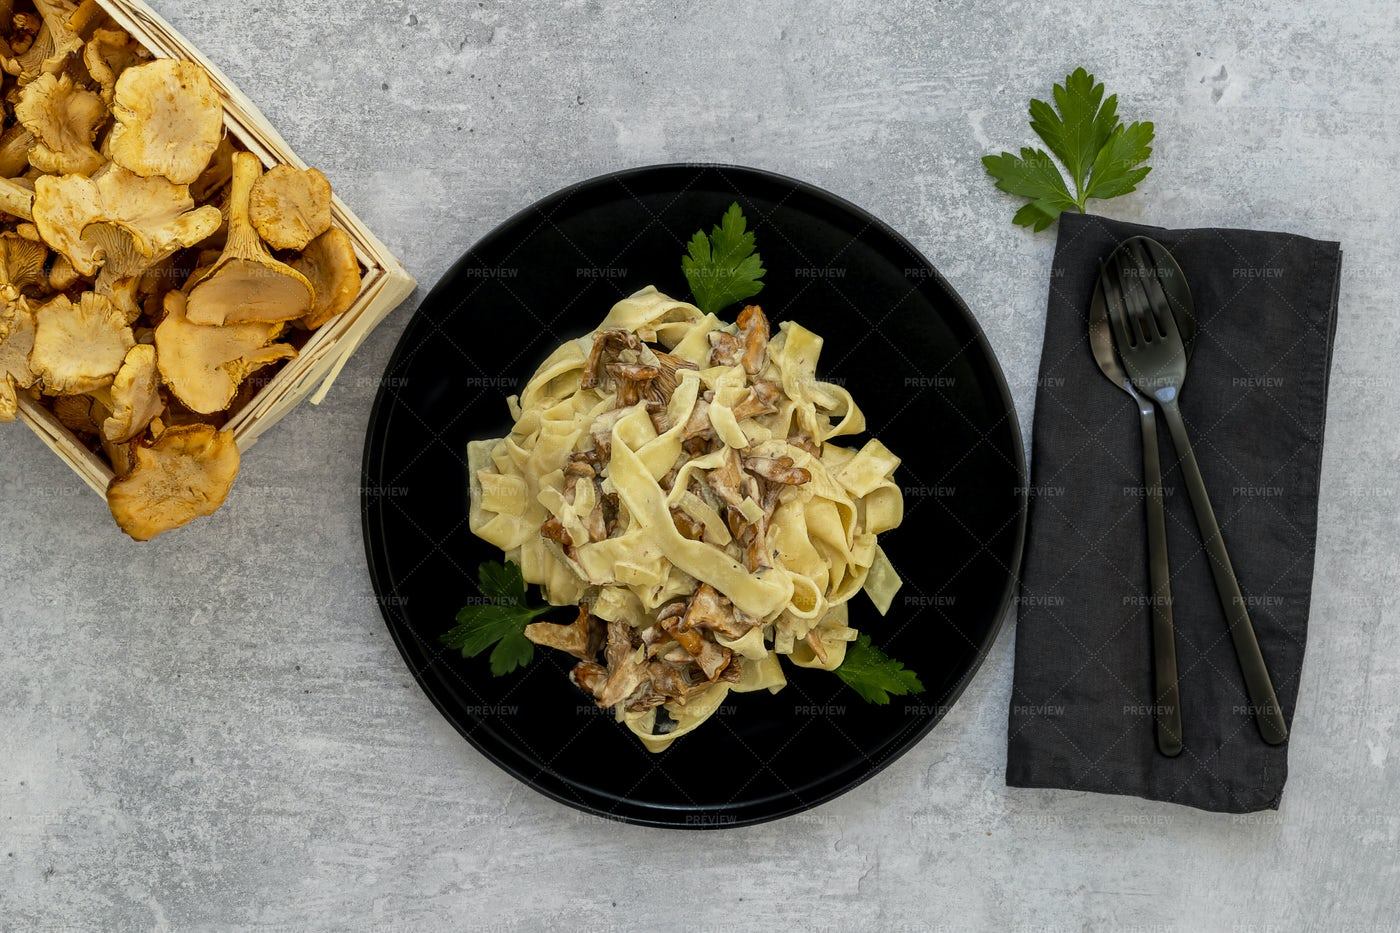 Tagliatelle With Chanterelle Mushrooms: Stock Photos